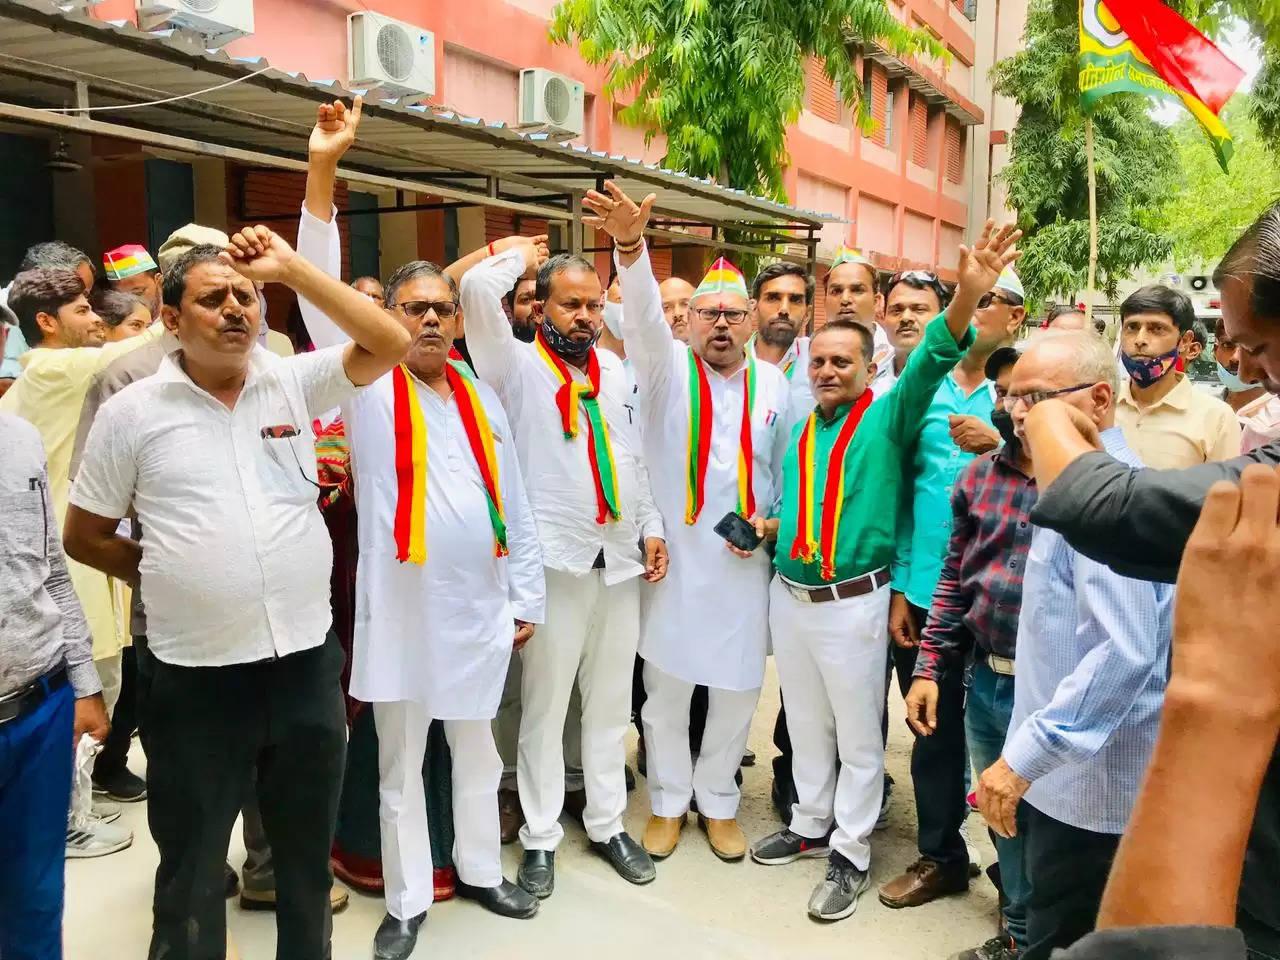 प्रगतिशील समाजवादी पार्टी ने मुख्यमंत्री को सम्बोधित ज्ञापन सौपा